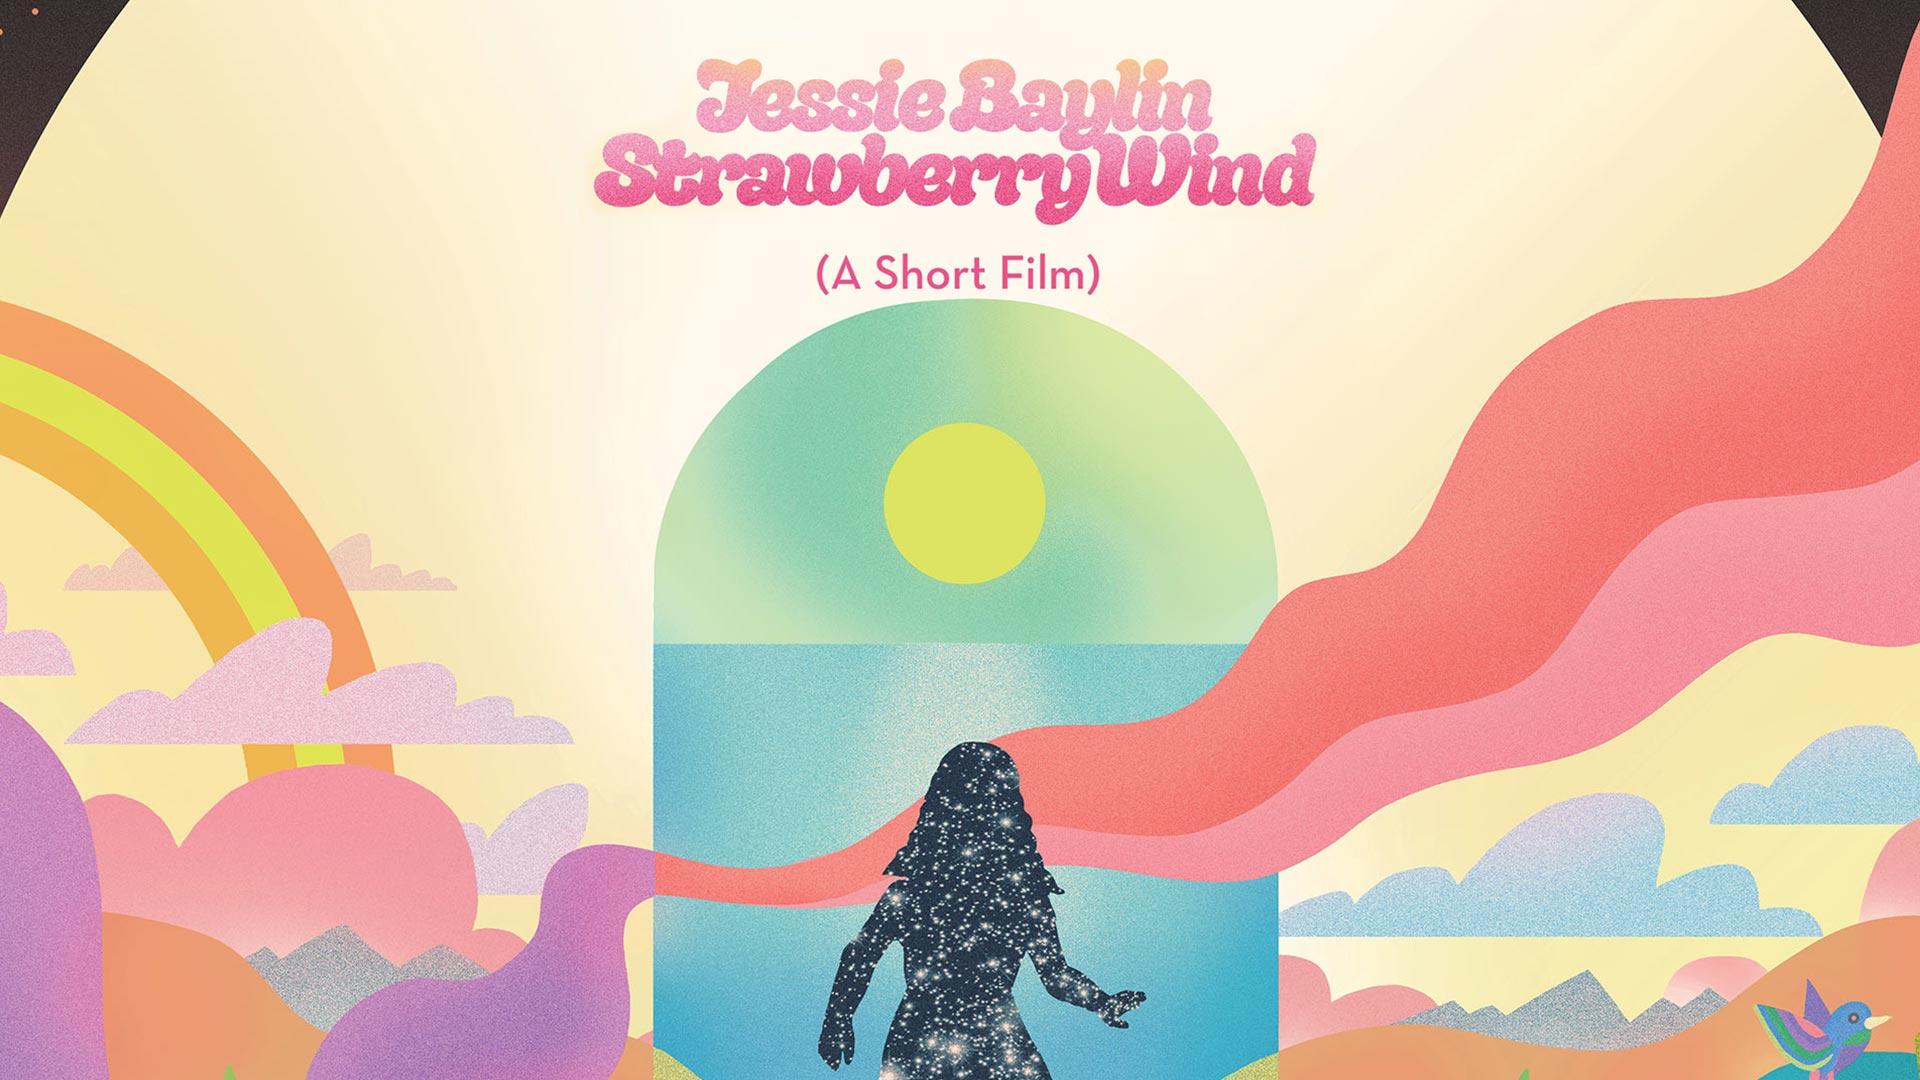 Jessie Baylin - Strawberry Wind (a short film) {Amazon Original}